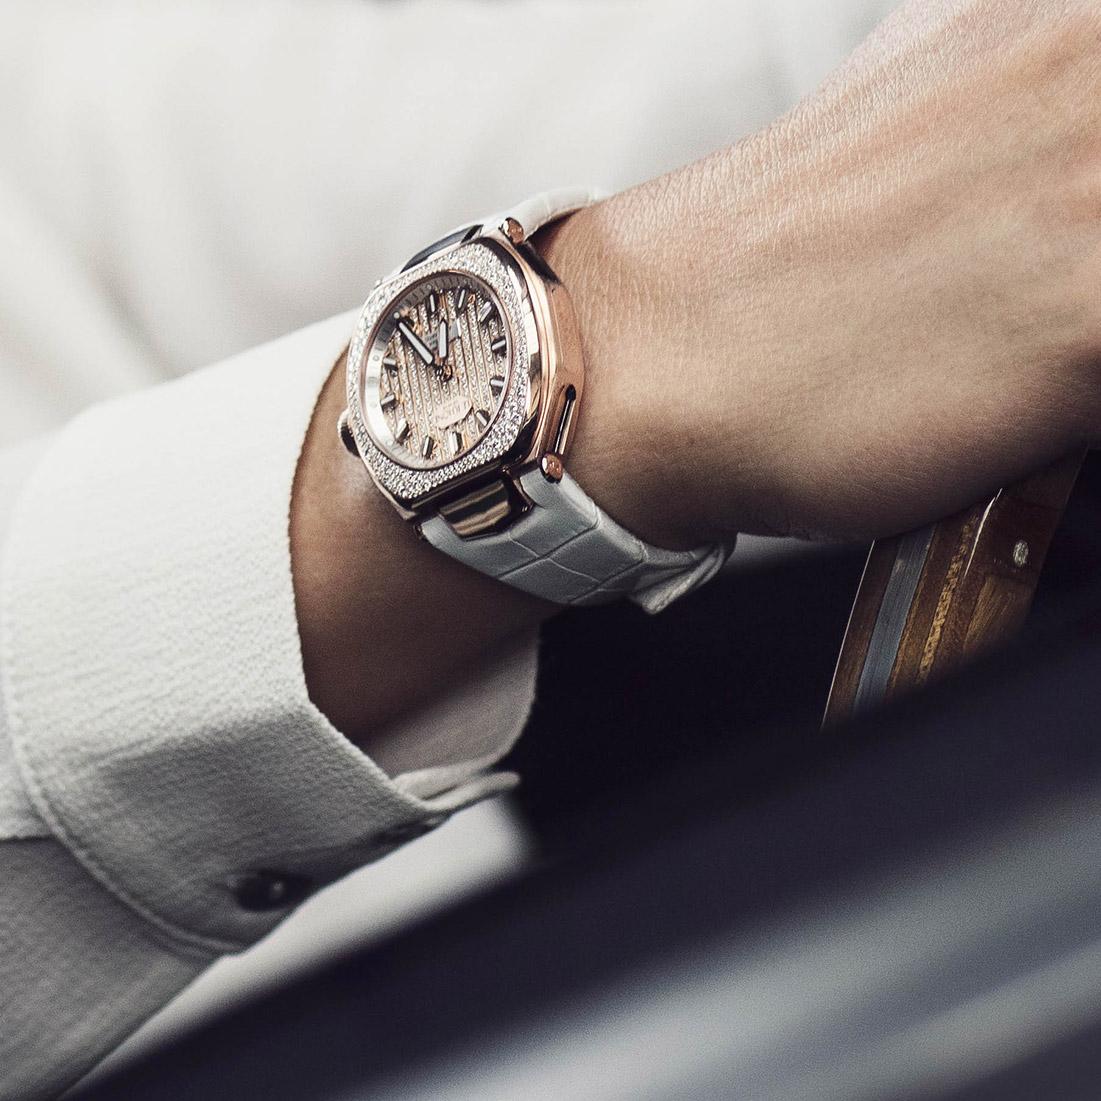 le-rhone-watch-high-jewelery